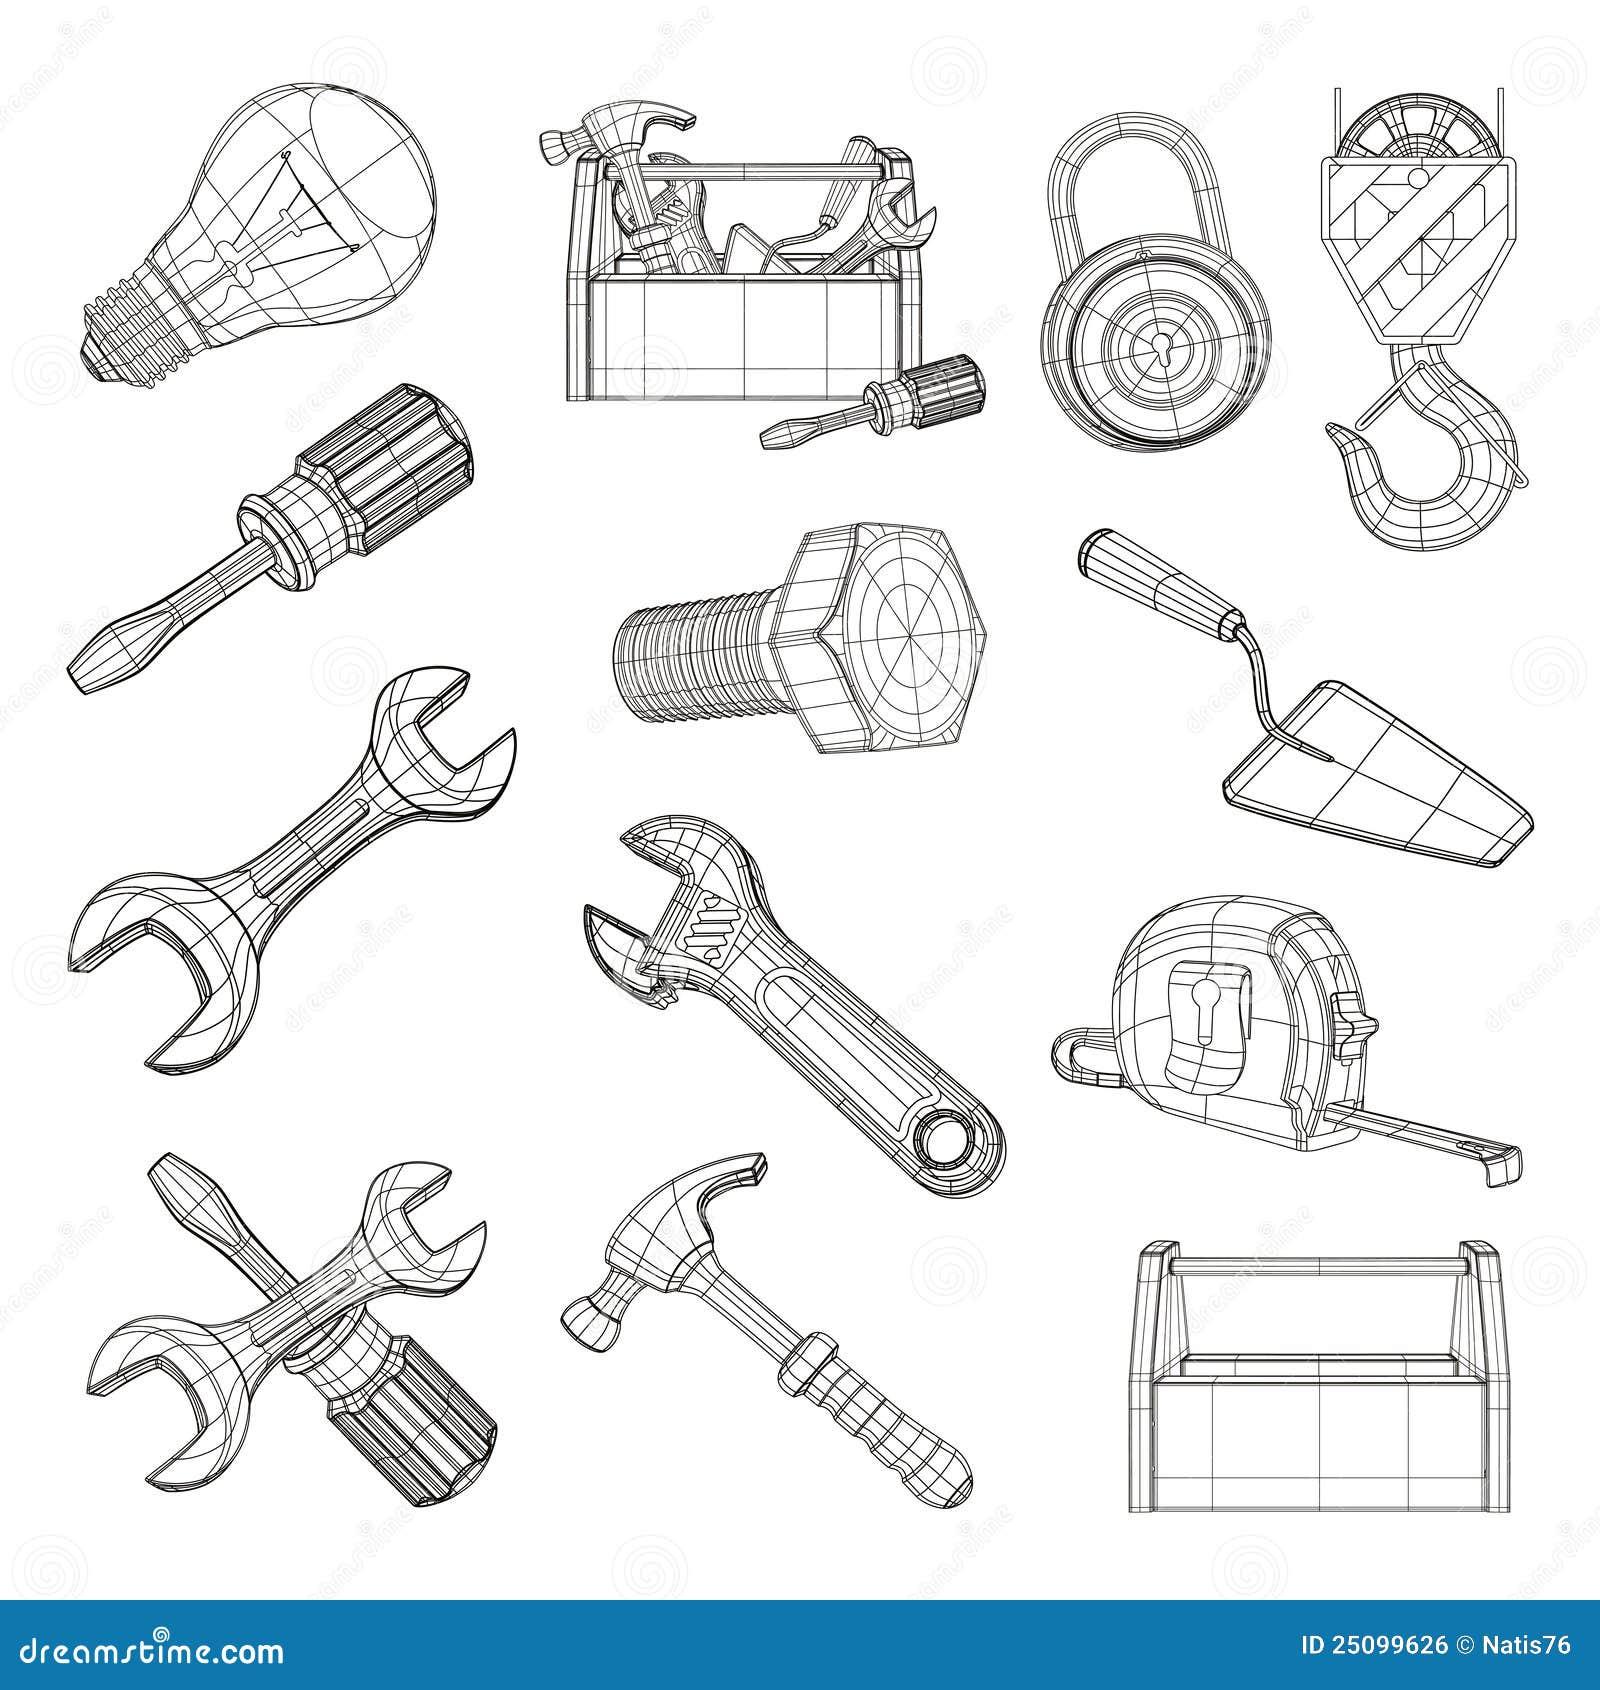 Drawing Tools Set Royalty Free Stock Image Image 25099626